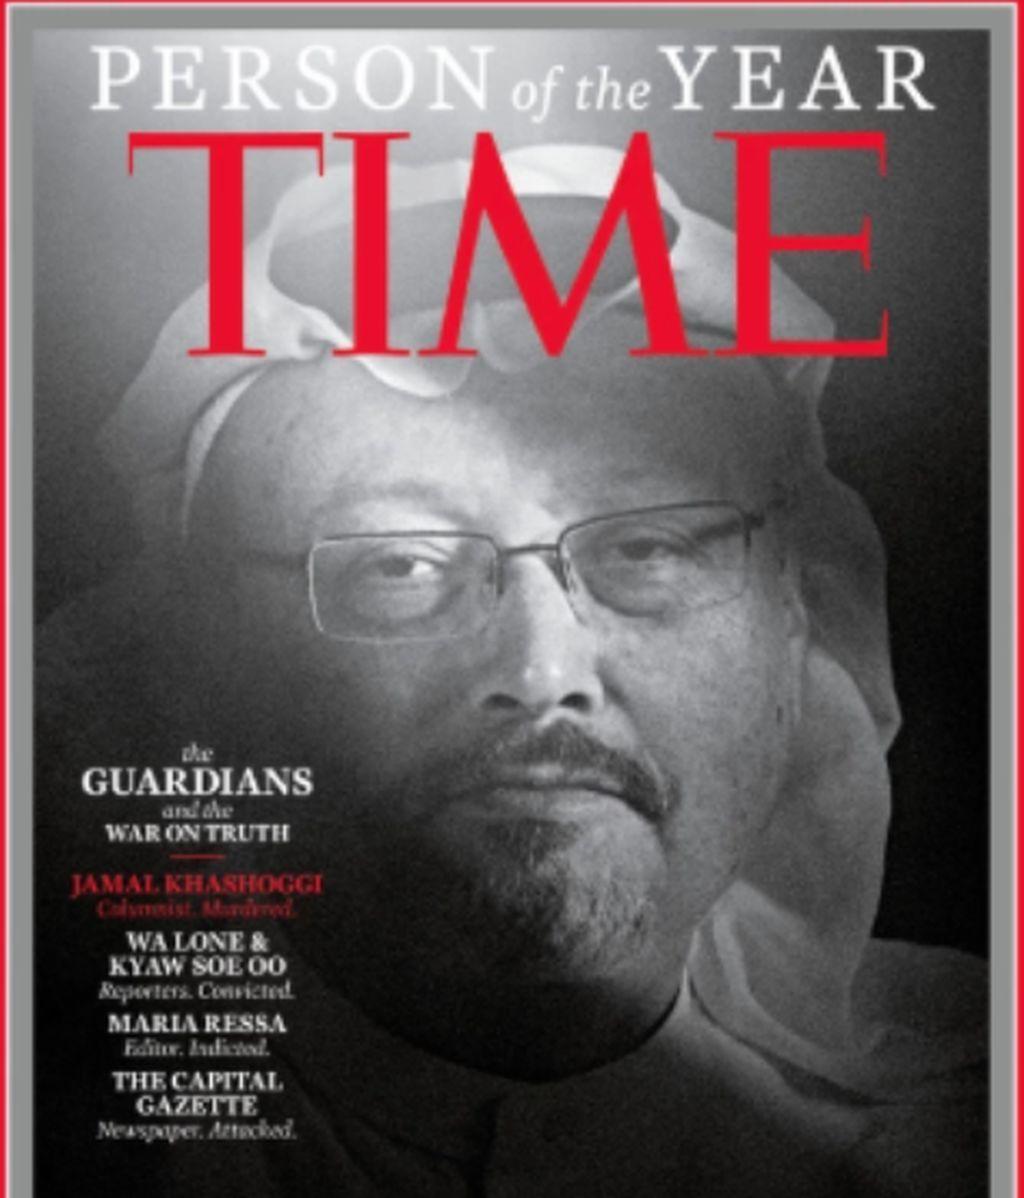 Khashoggi, personaje del año para la revista Time